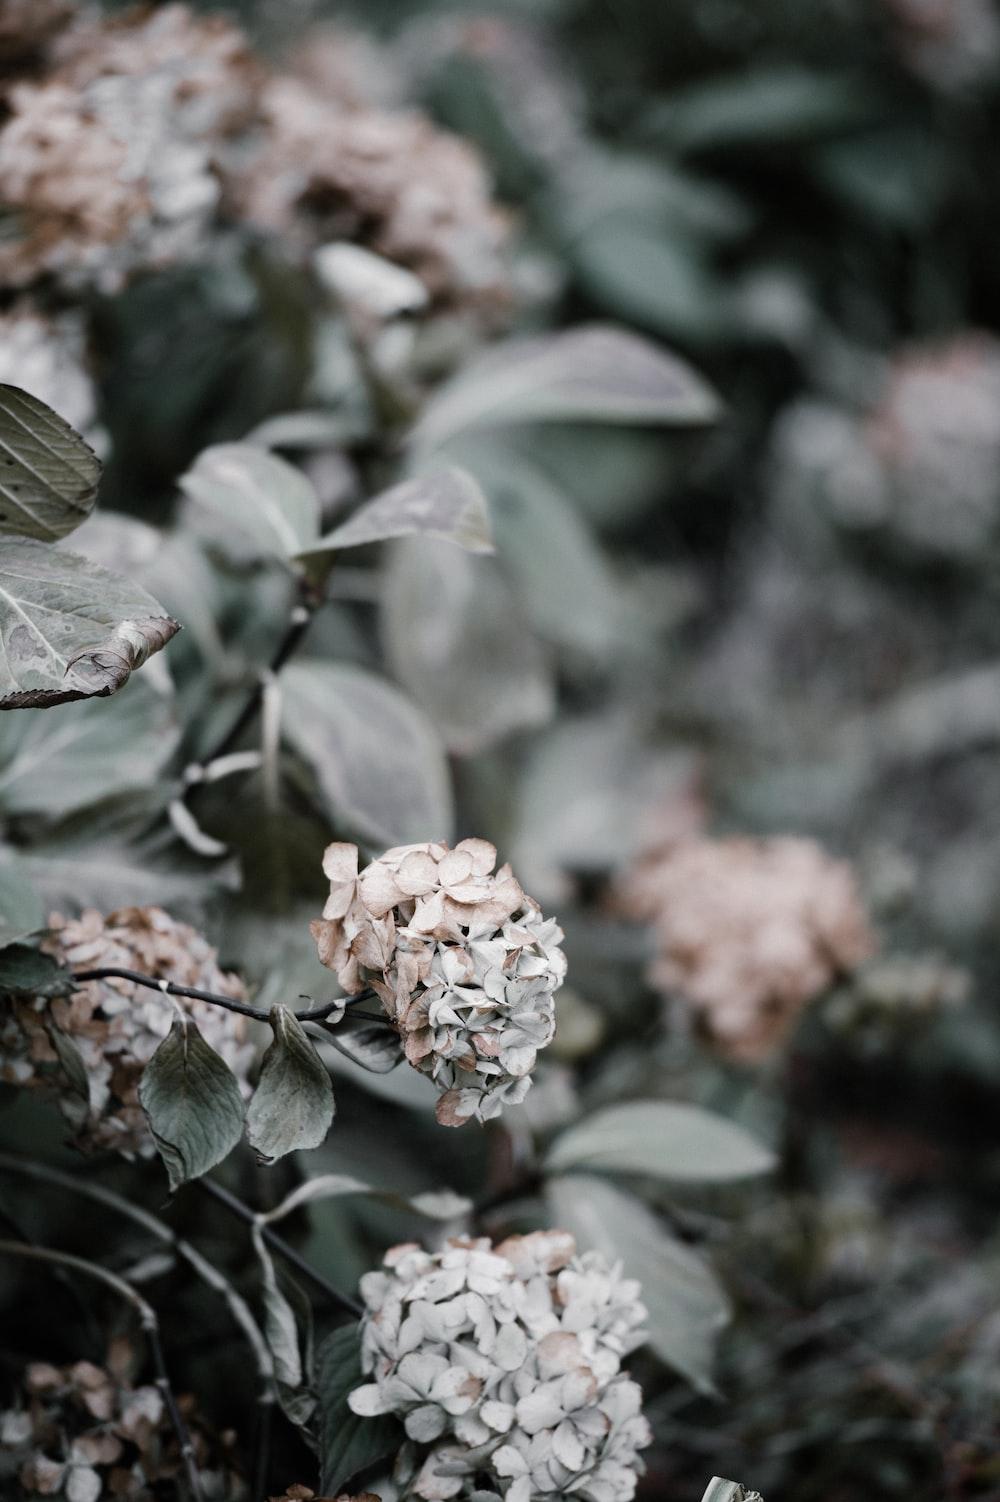 Woodland Flower Pictures Download Free Images On Unsplash